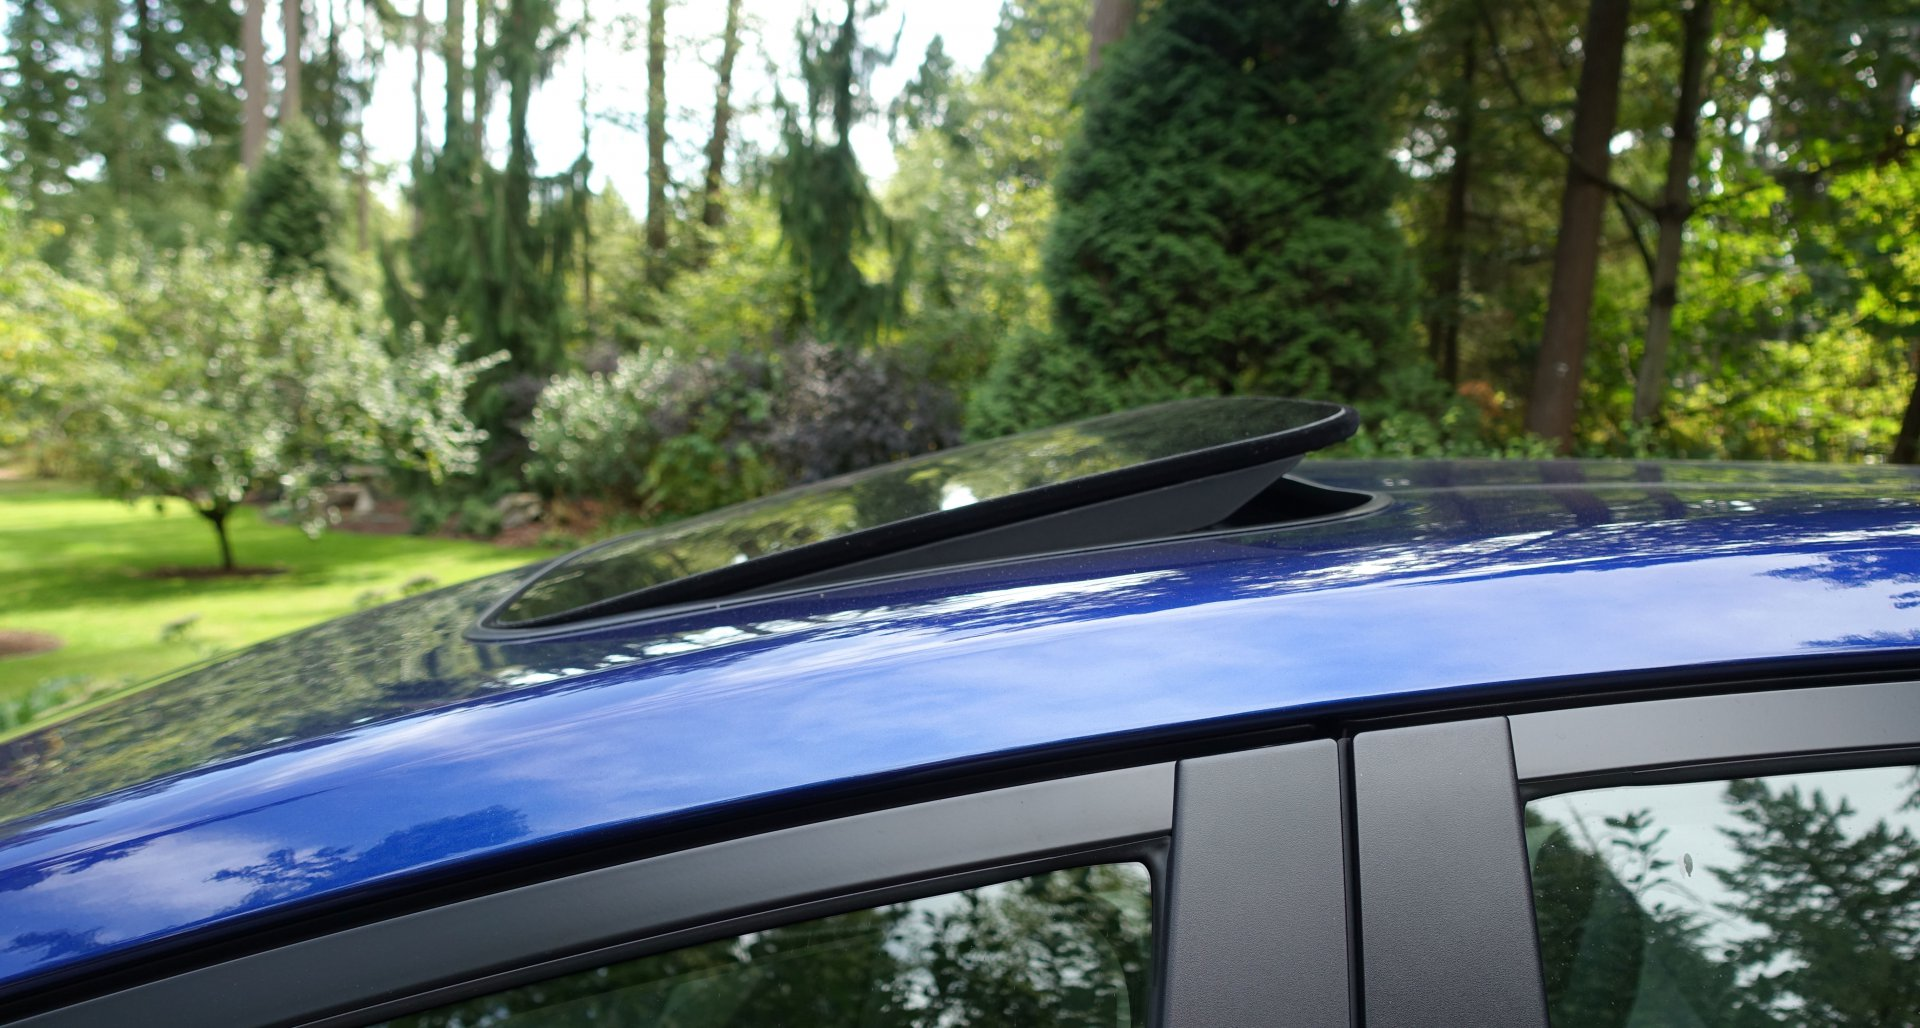 2015 Prius V Aftermarket Sunroof Priuschat